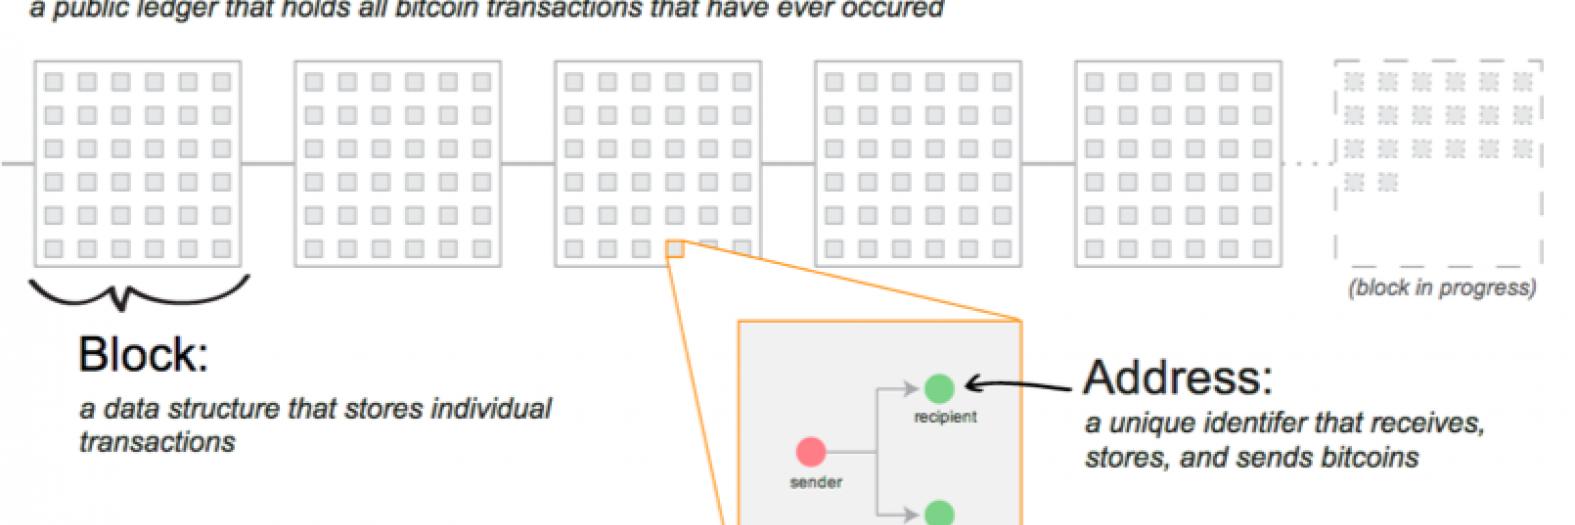 Infographic defining key terminology: blockchain, transaction, address